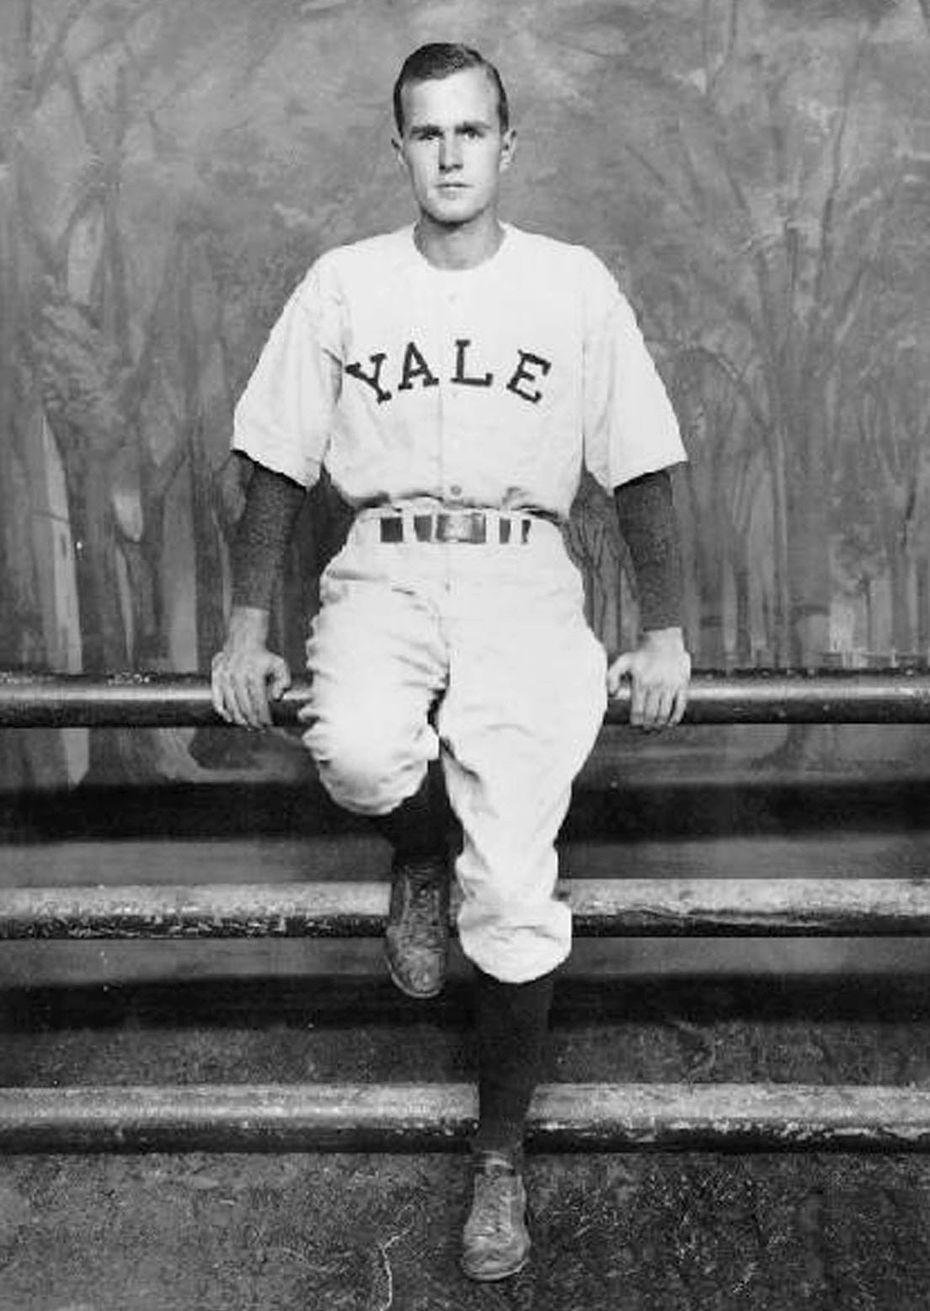 Bush in his baseball uniform at Yale University, circa 1945-48. (George W. Bush Library)